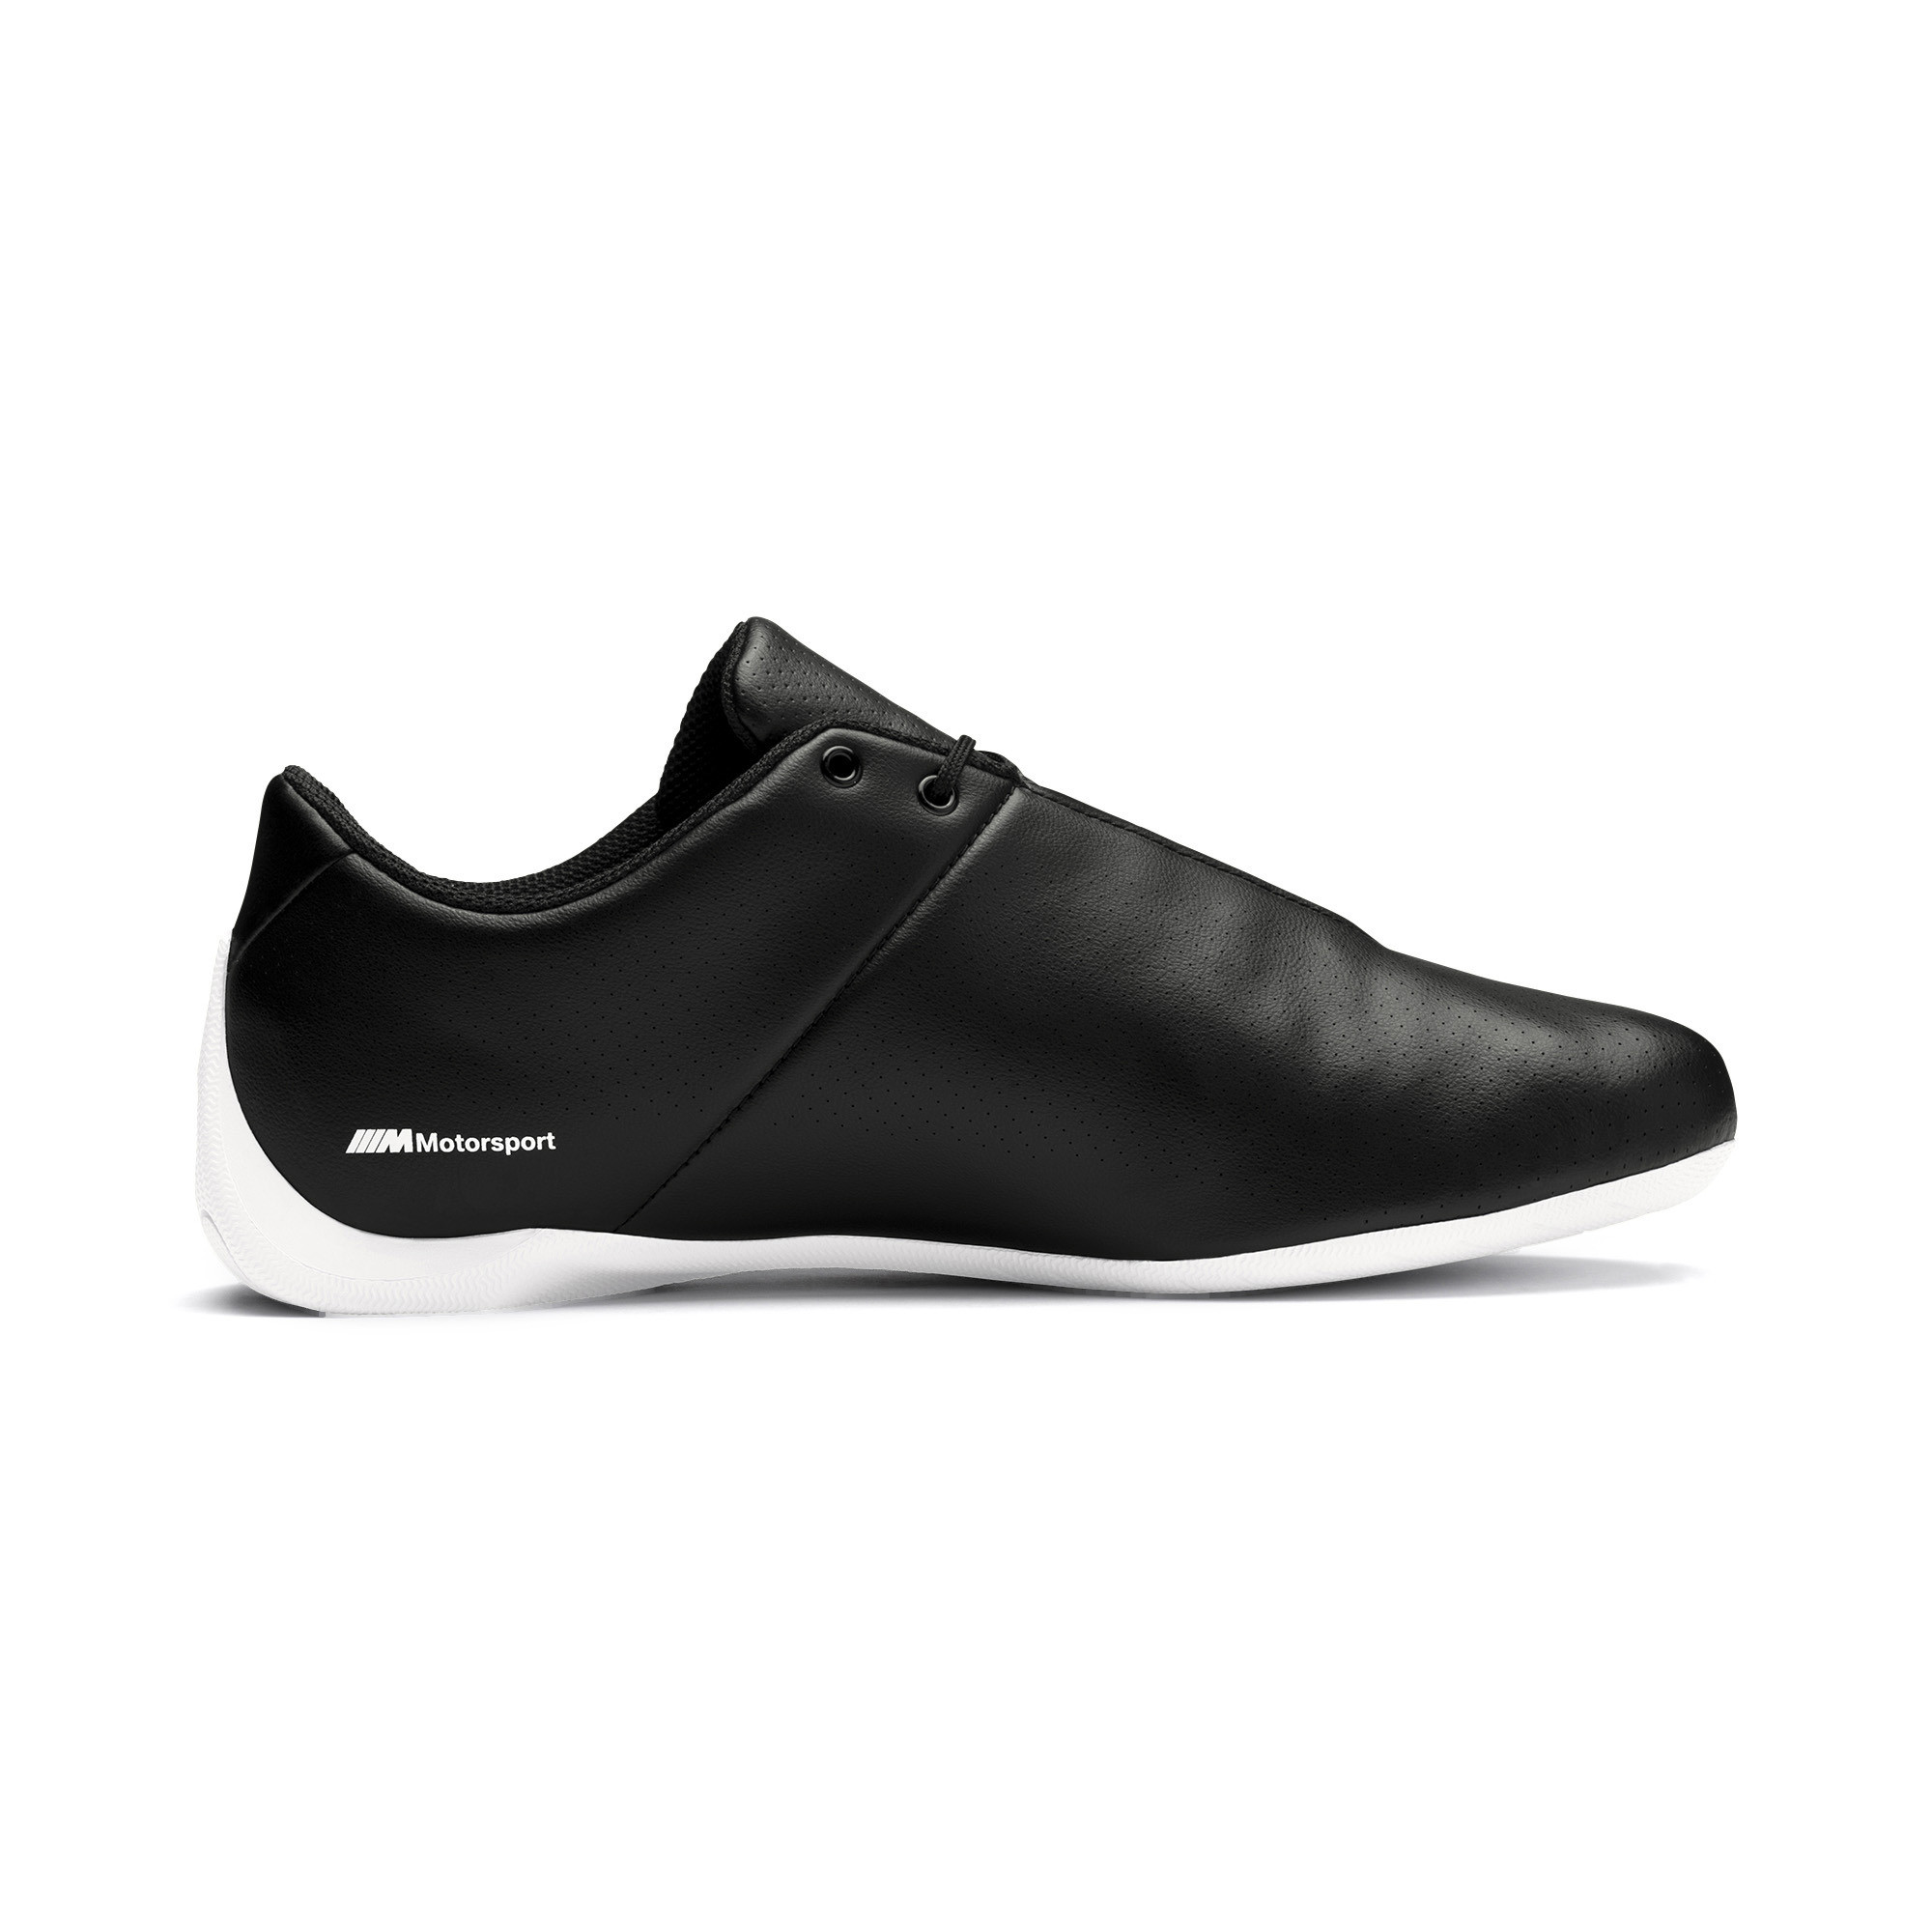 Indexbild 22 - PUMA BMW M Motorsport Future Cat Ultra Sneaker Unisex Schuhe Neu